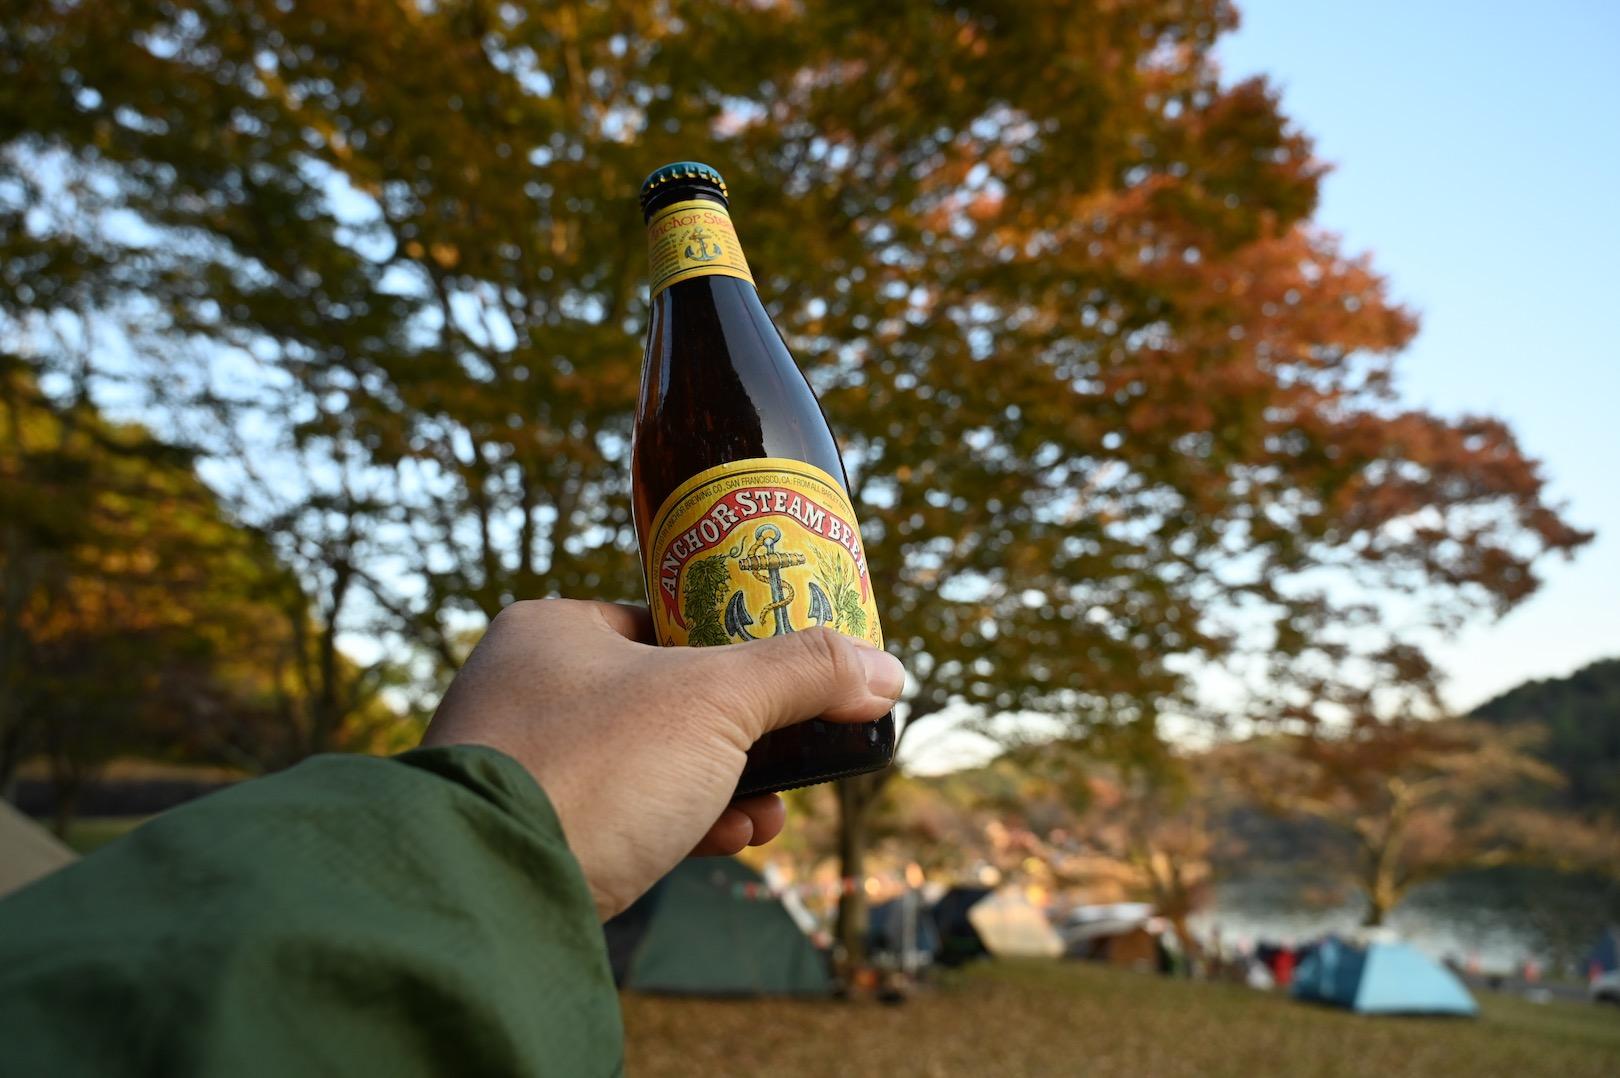 taketin さんが平生ヤクルト感覚で飲んでいる高級クラフトビール